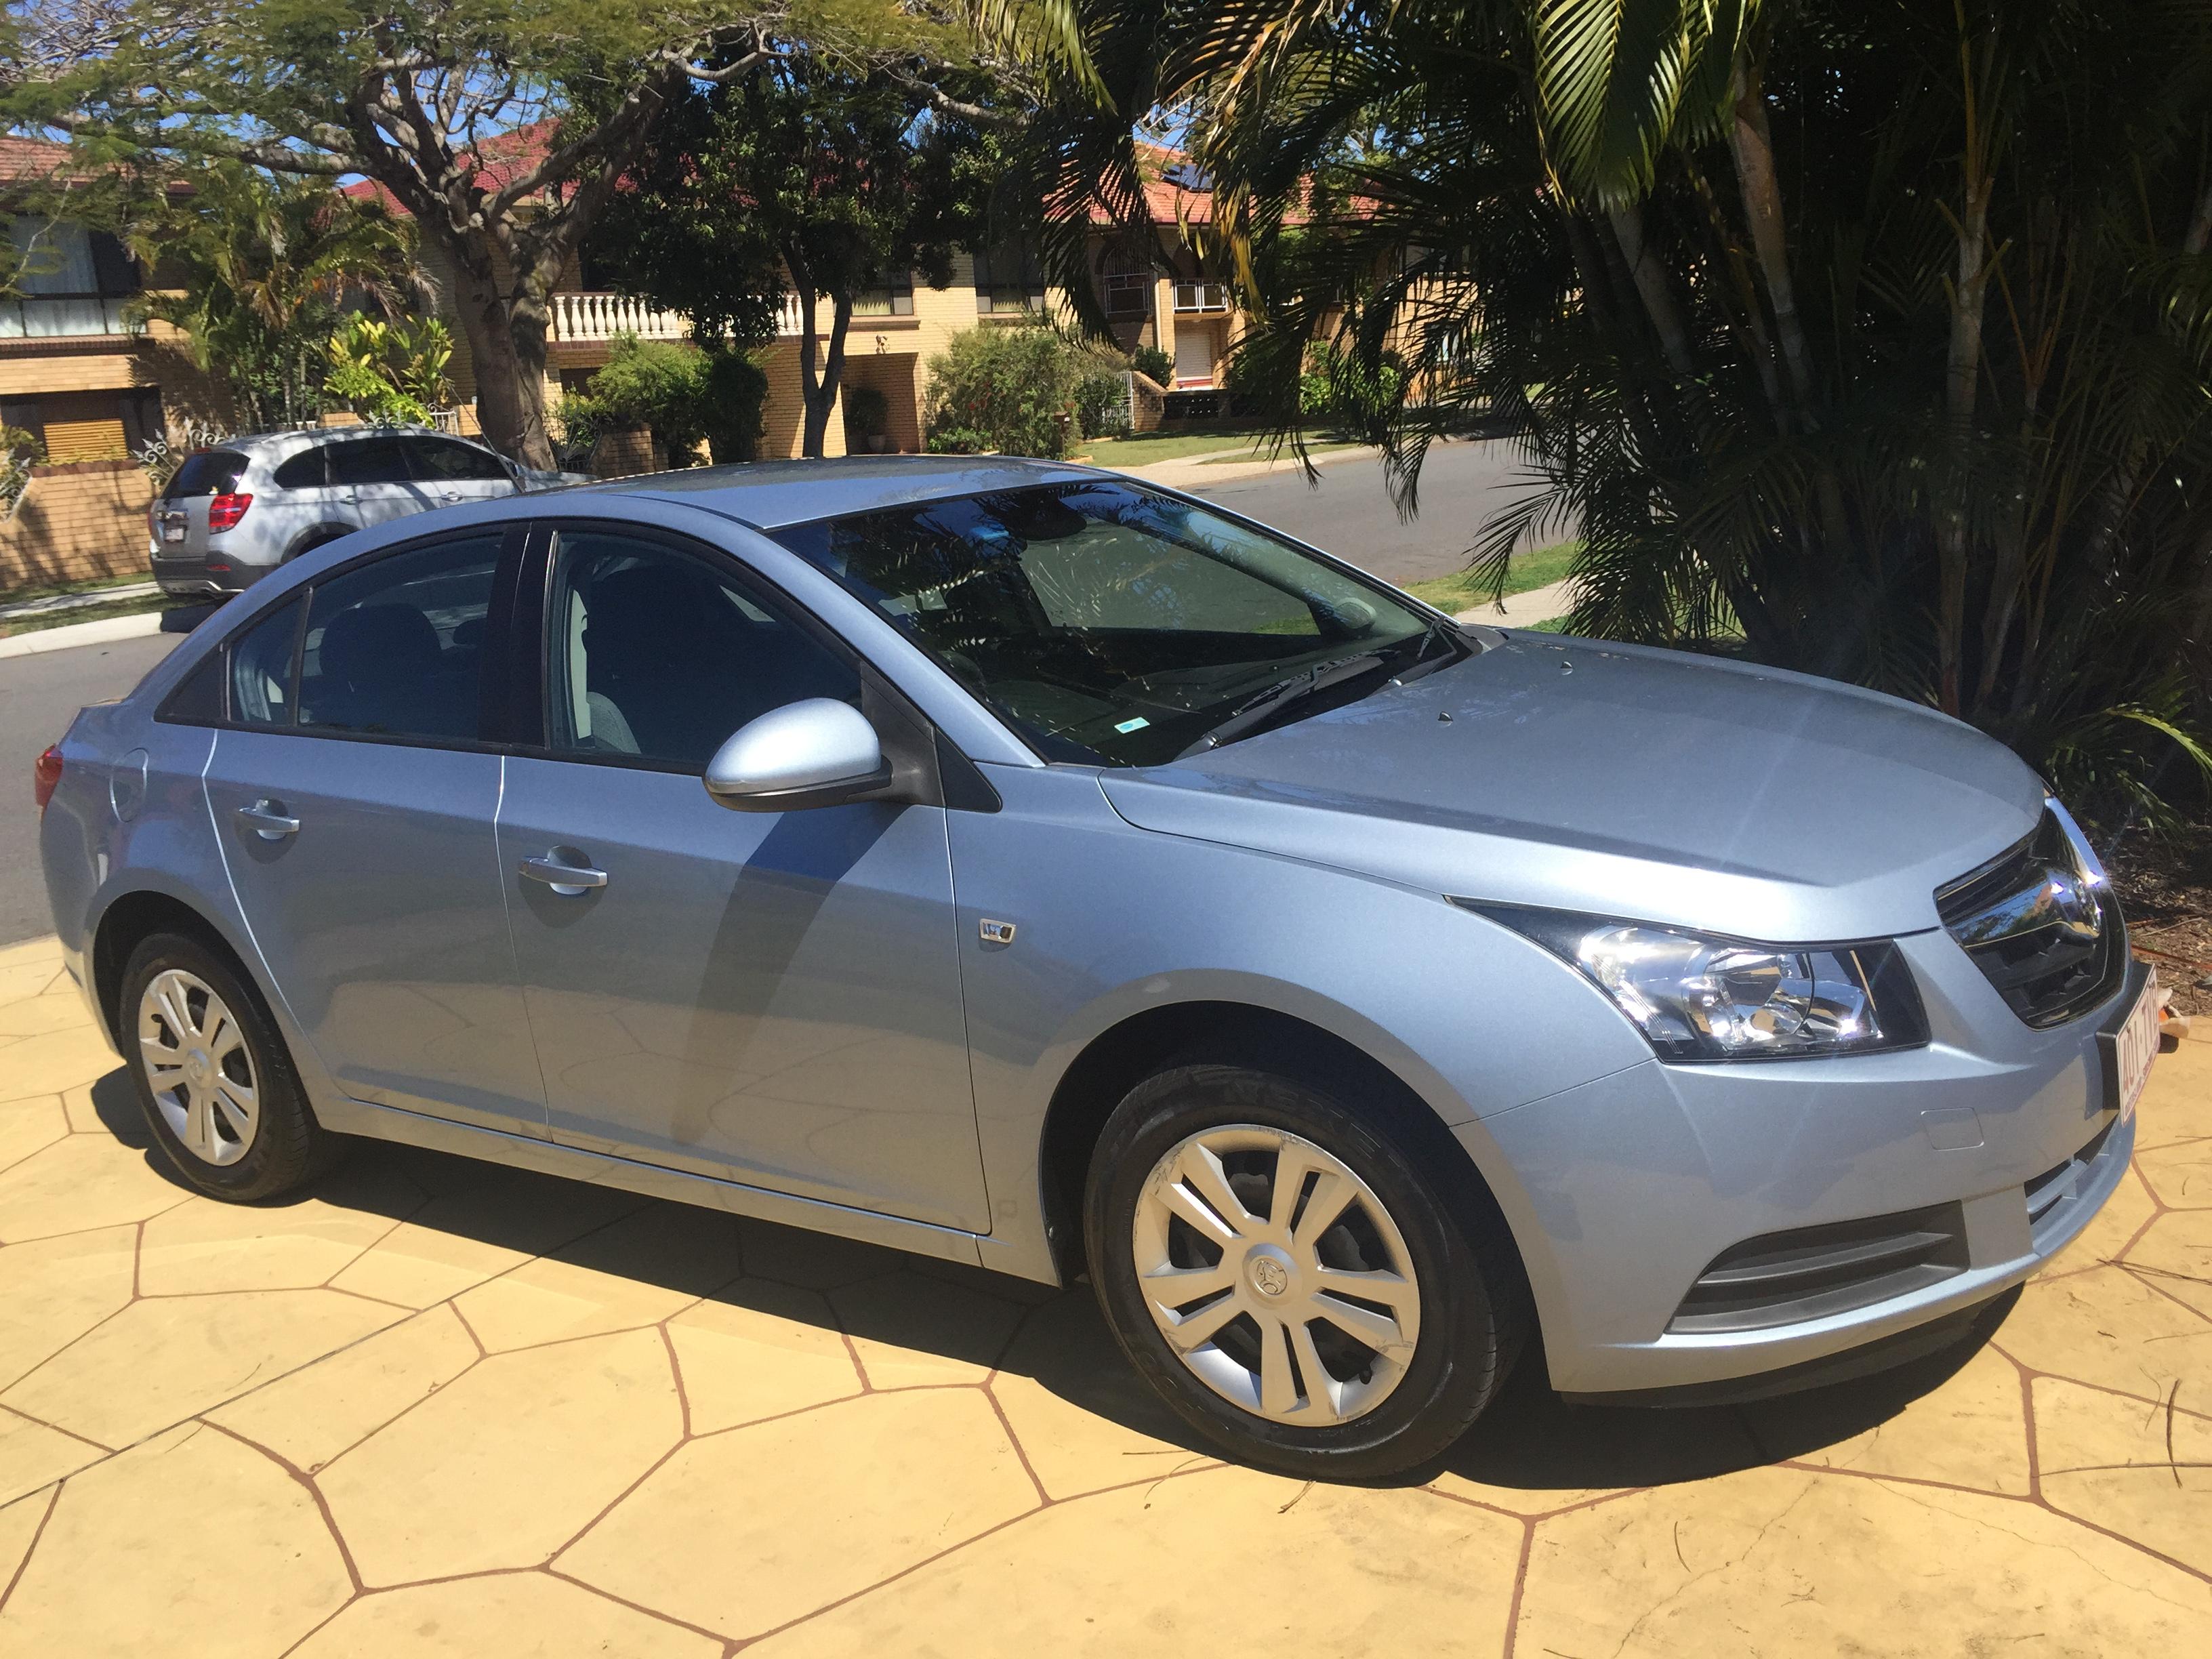 2010 Holden Cruze Cd Jg Car Sales Qld Brisbane South border=